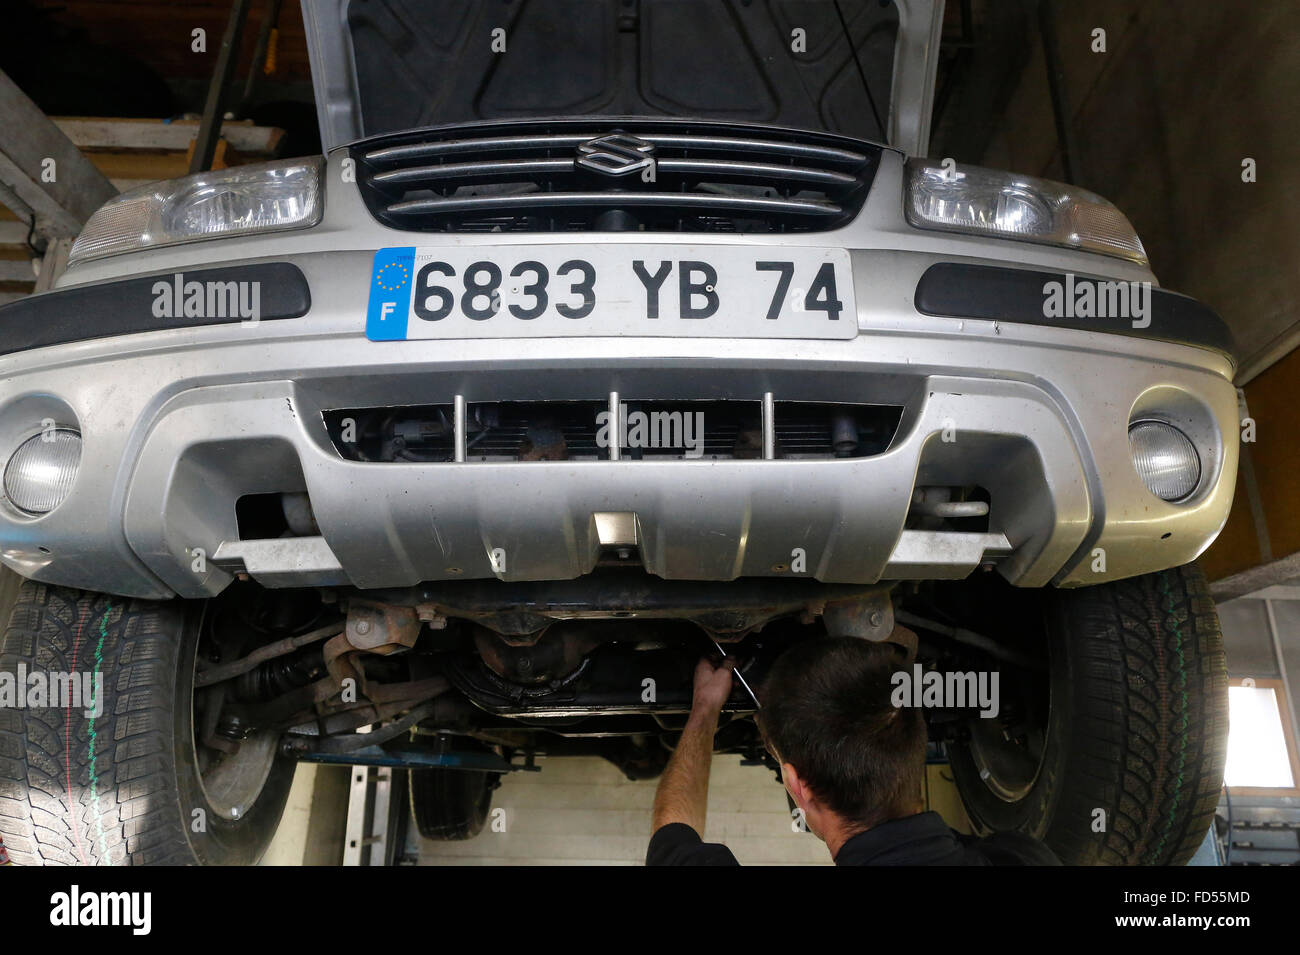 France garage car stockfotos france garage car bilder for Garage ford vienne